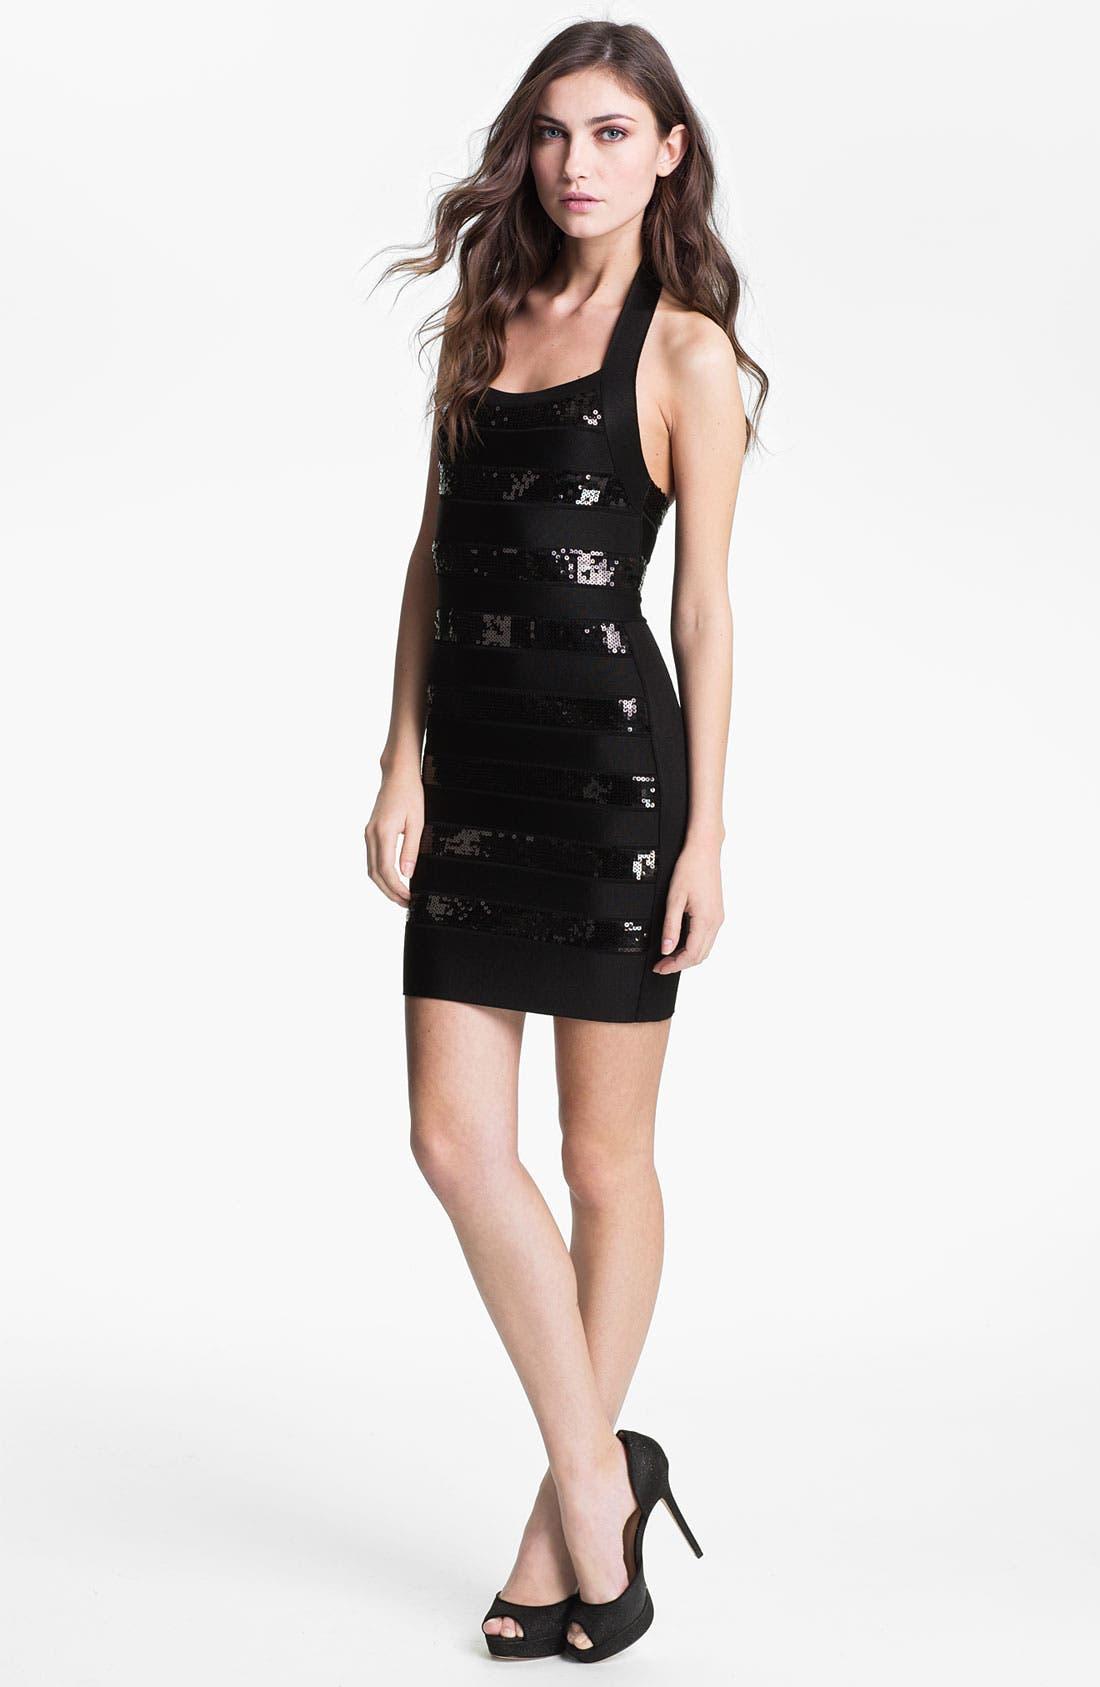 Alternate Image 1 Selected - French Connection 'Sparkle Spotlight' Ponte Knit Sheath Dress